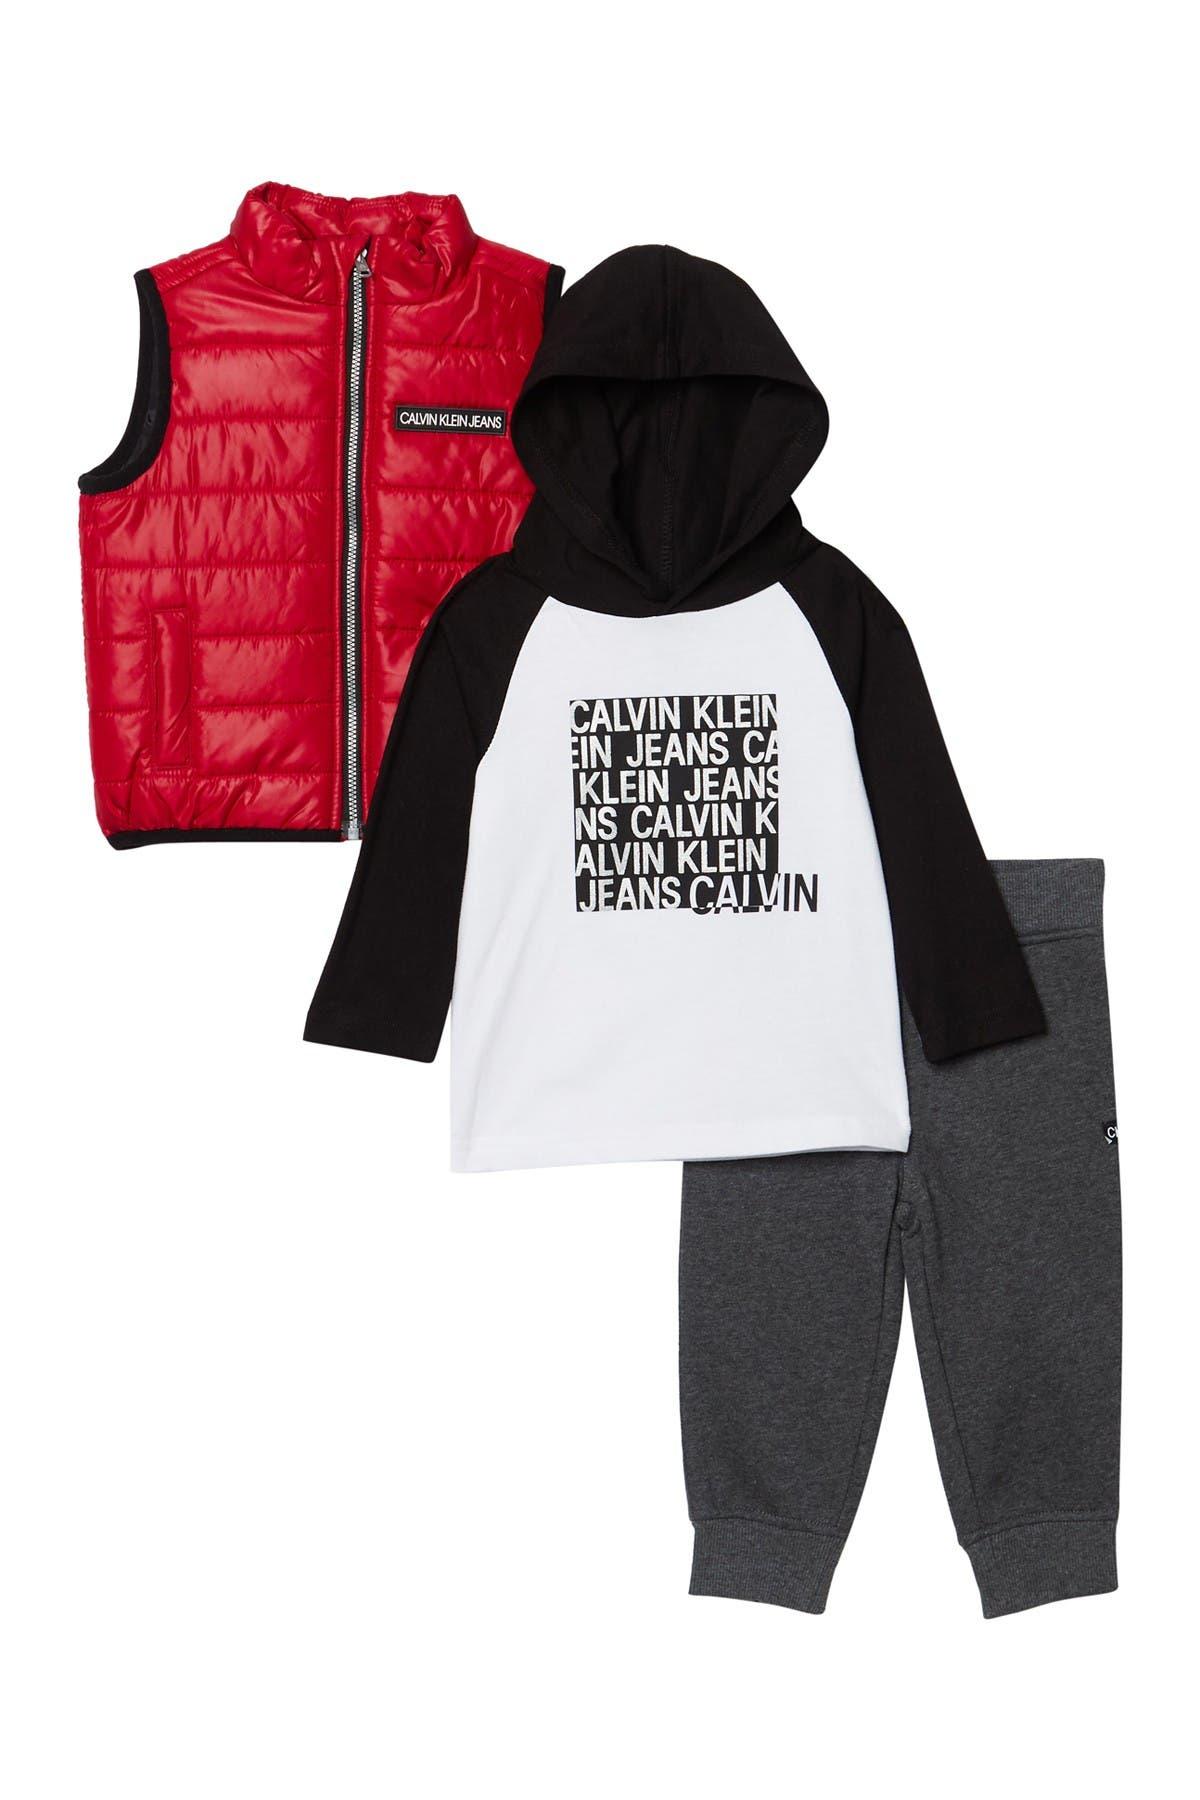 Image of Calvin Klein Puffer Vest, Top, & Pants Set